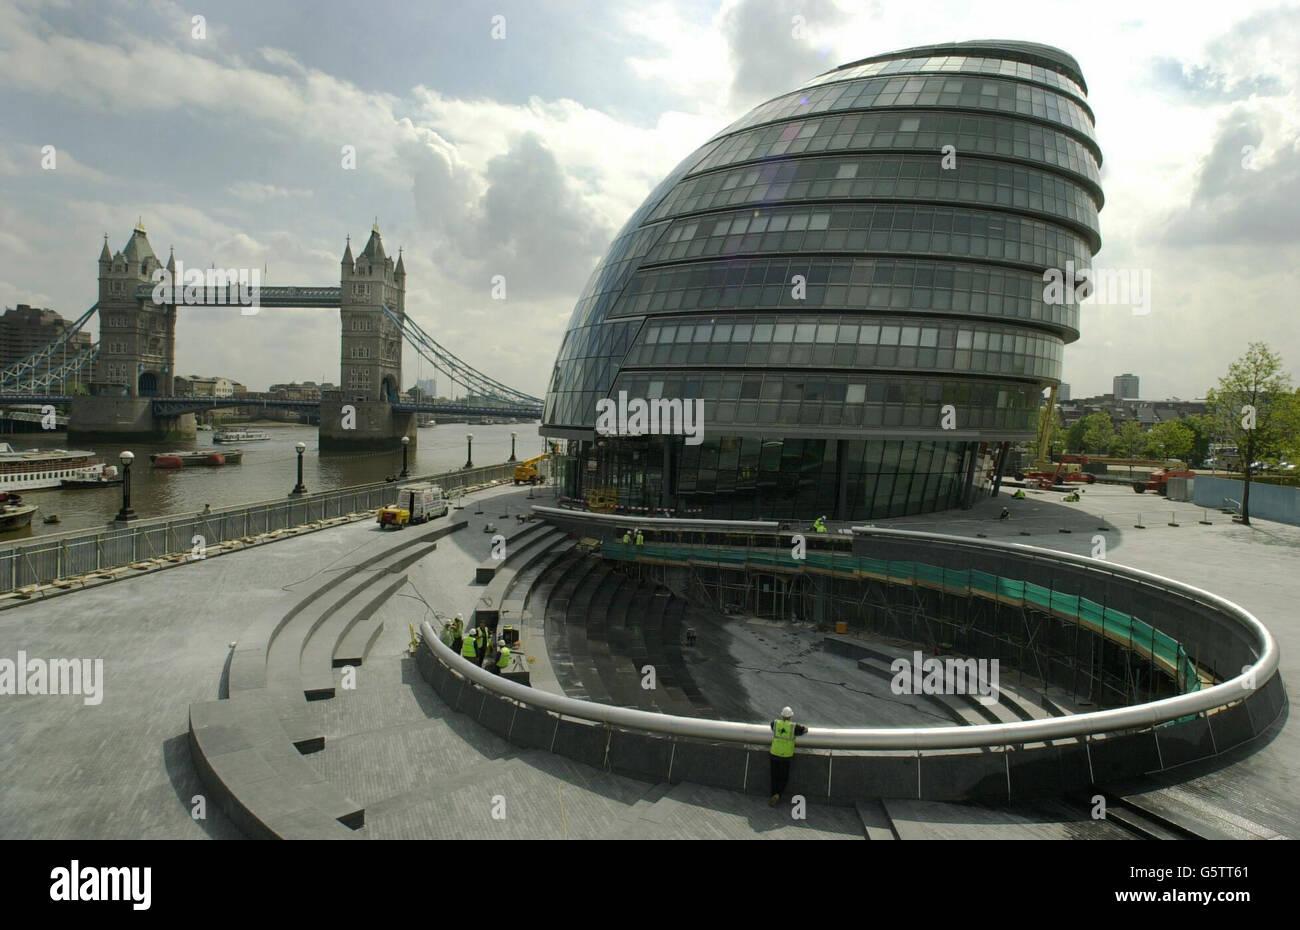 New GLA building - Stock Image